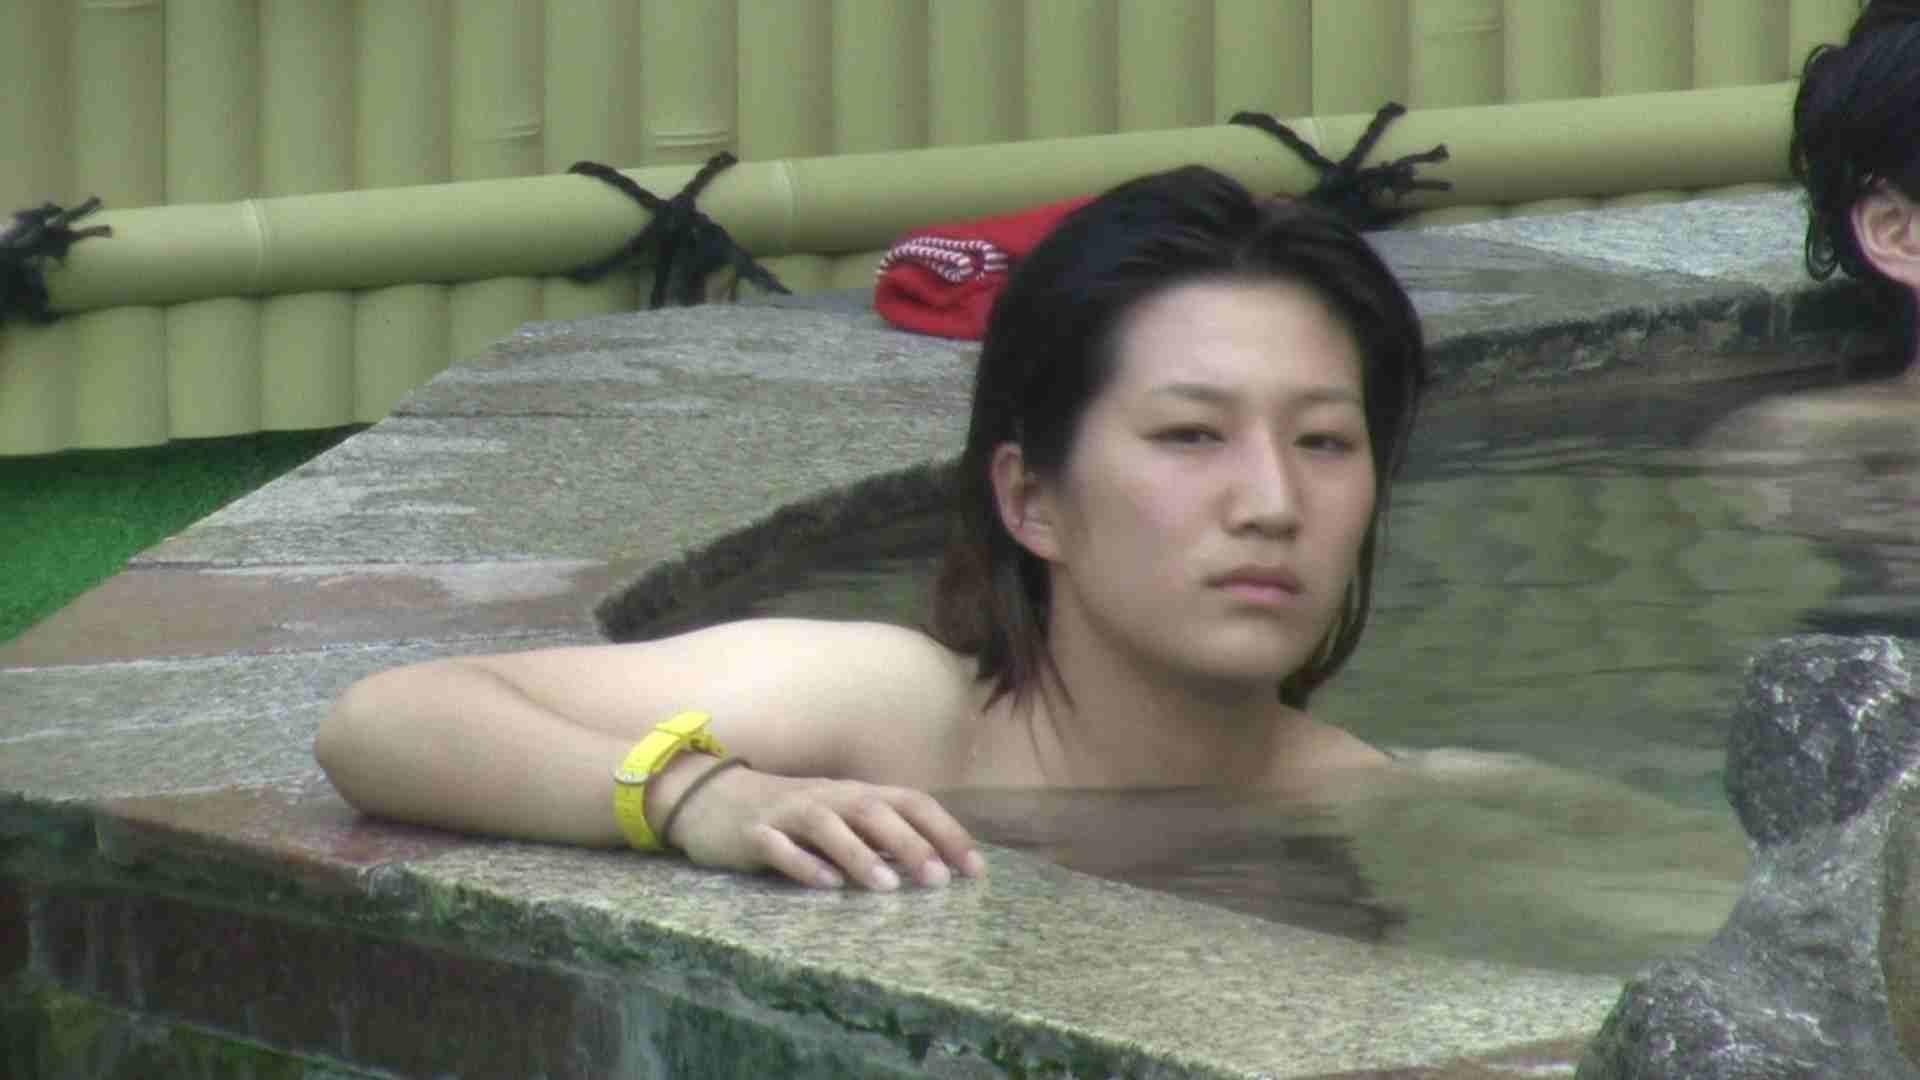 Aquaな露天風呂Vol.132 盗撮映像  31Pix 8